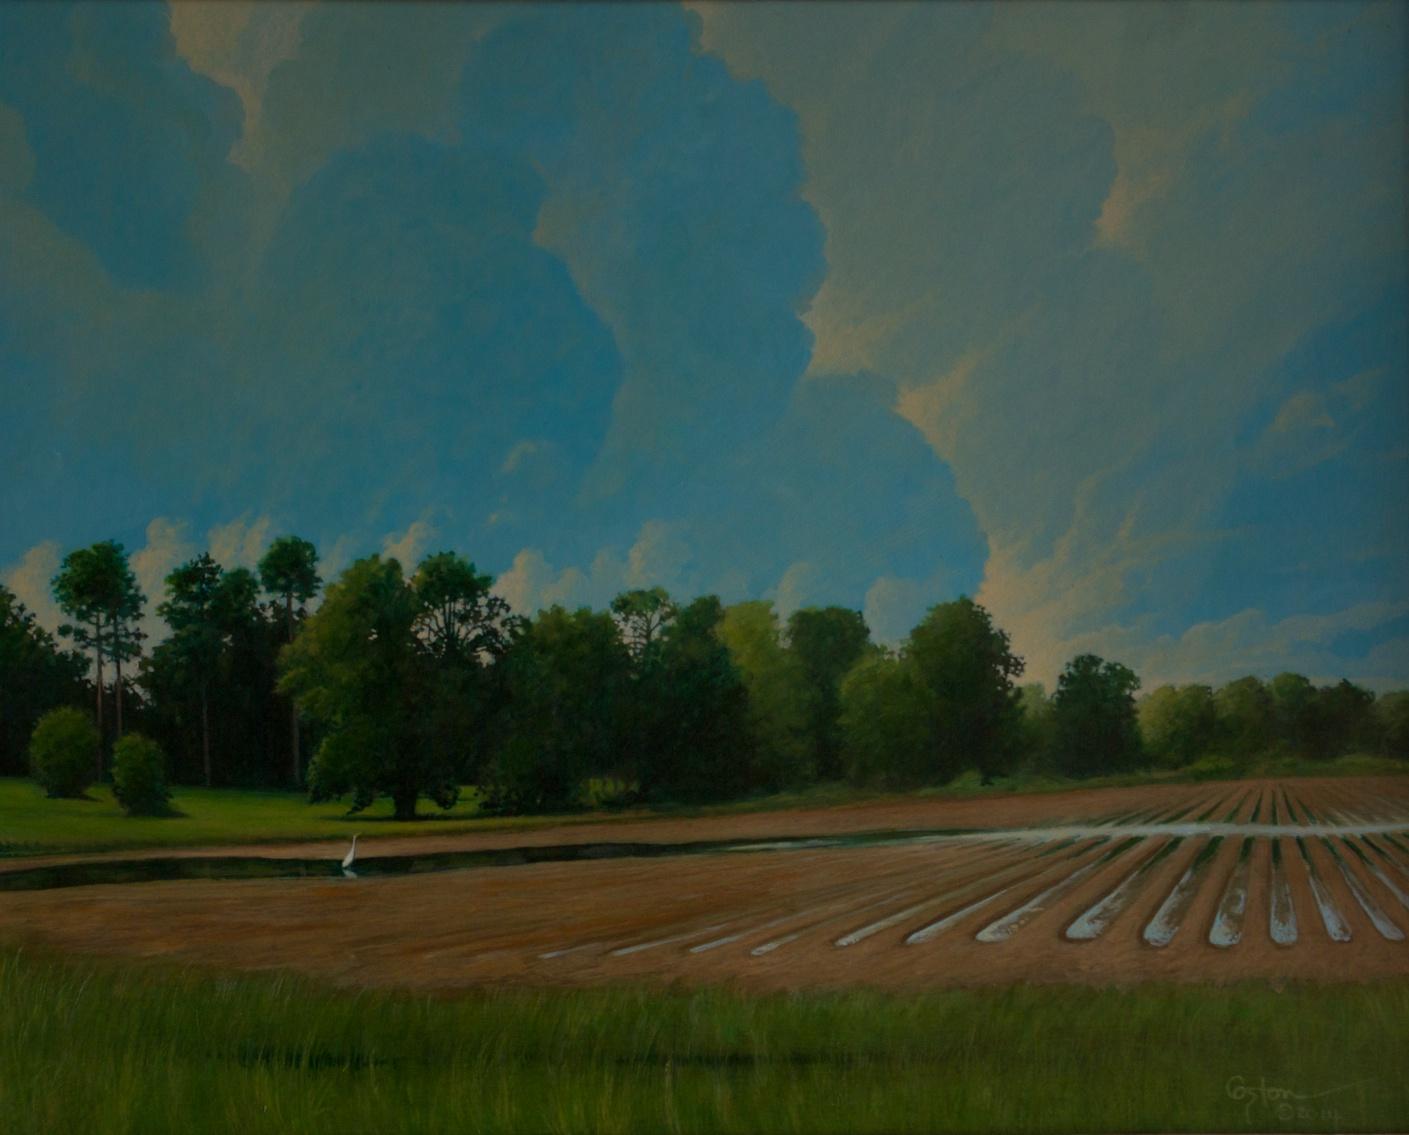 Seasonal Creek, Daniel Coston, 2014